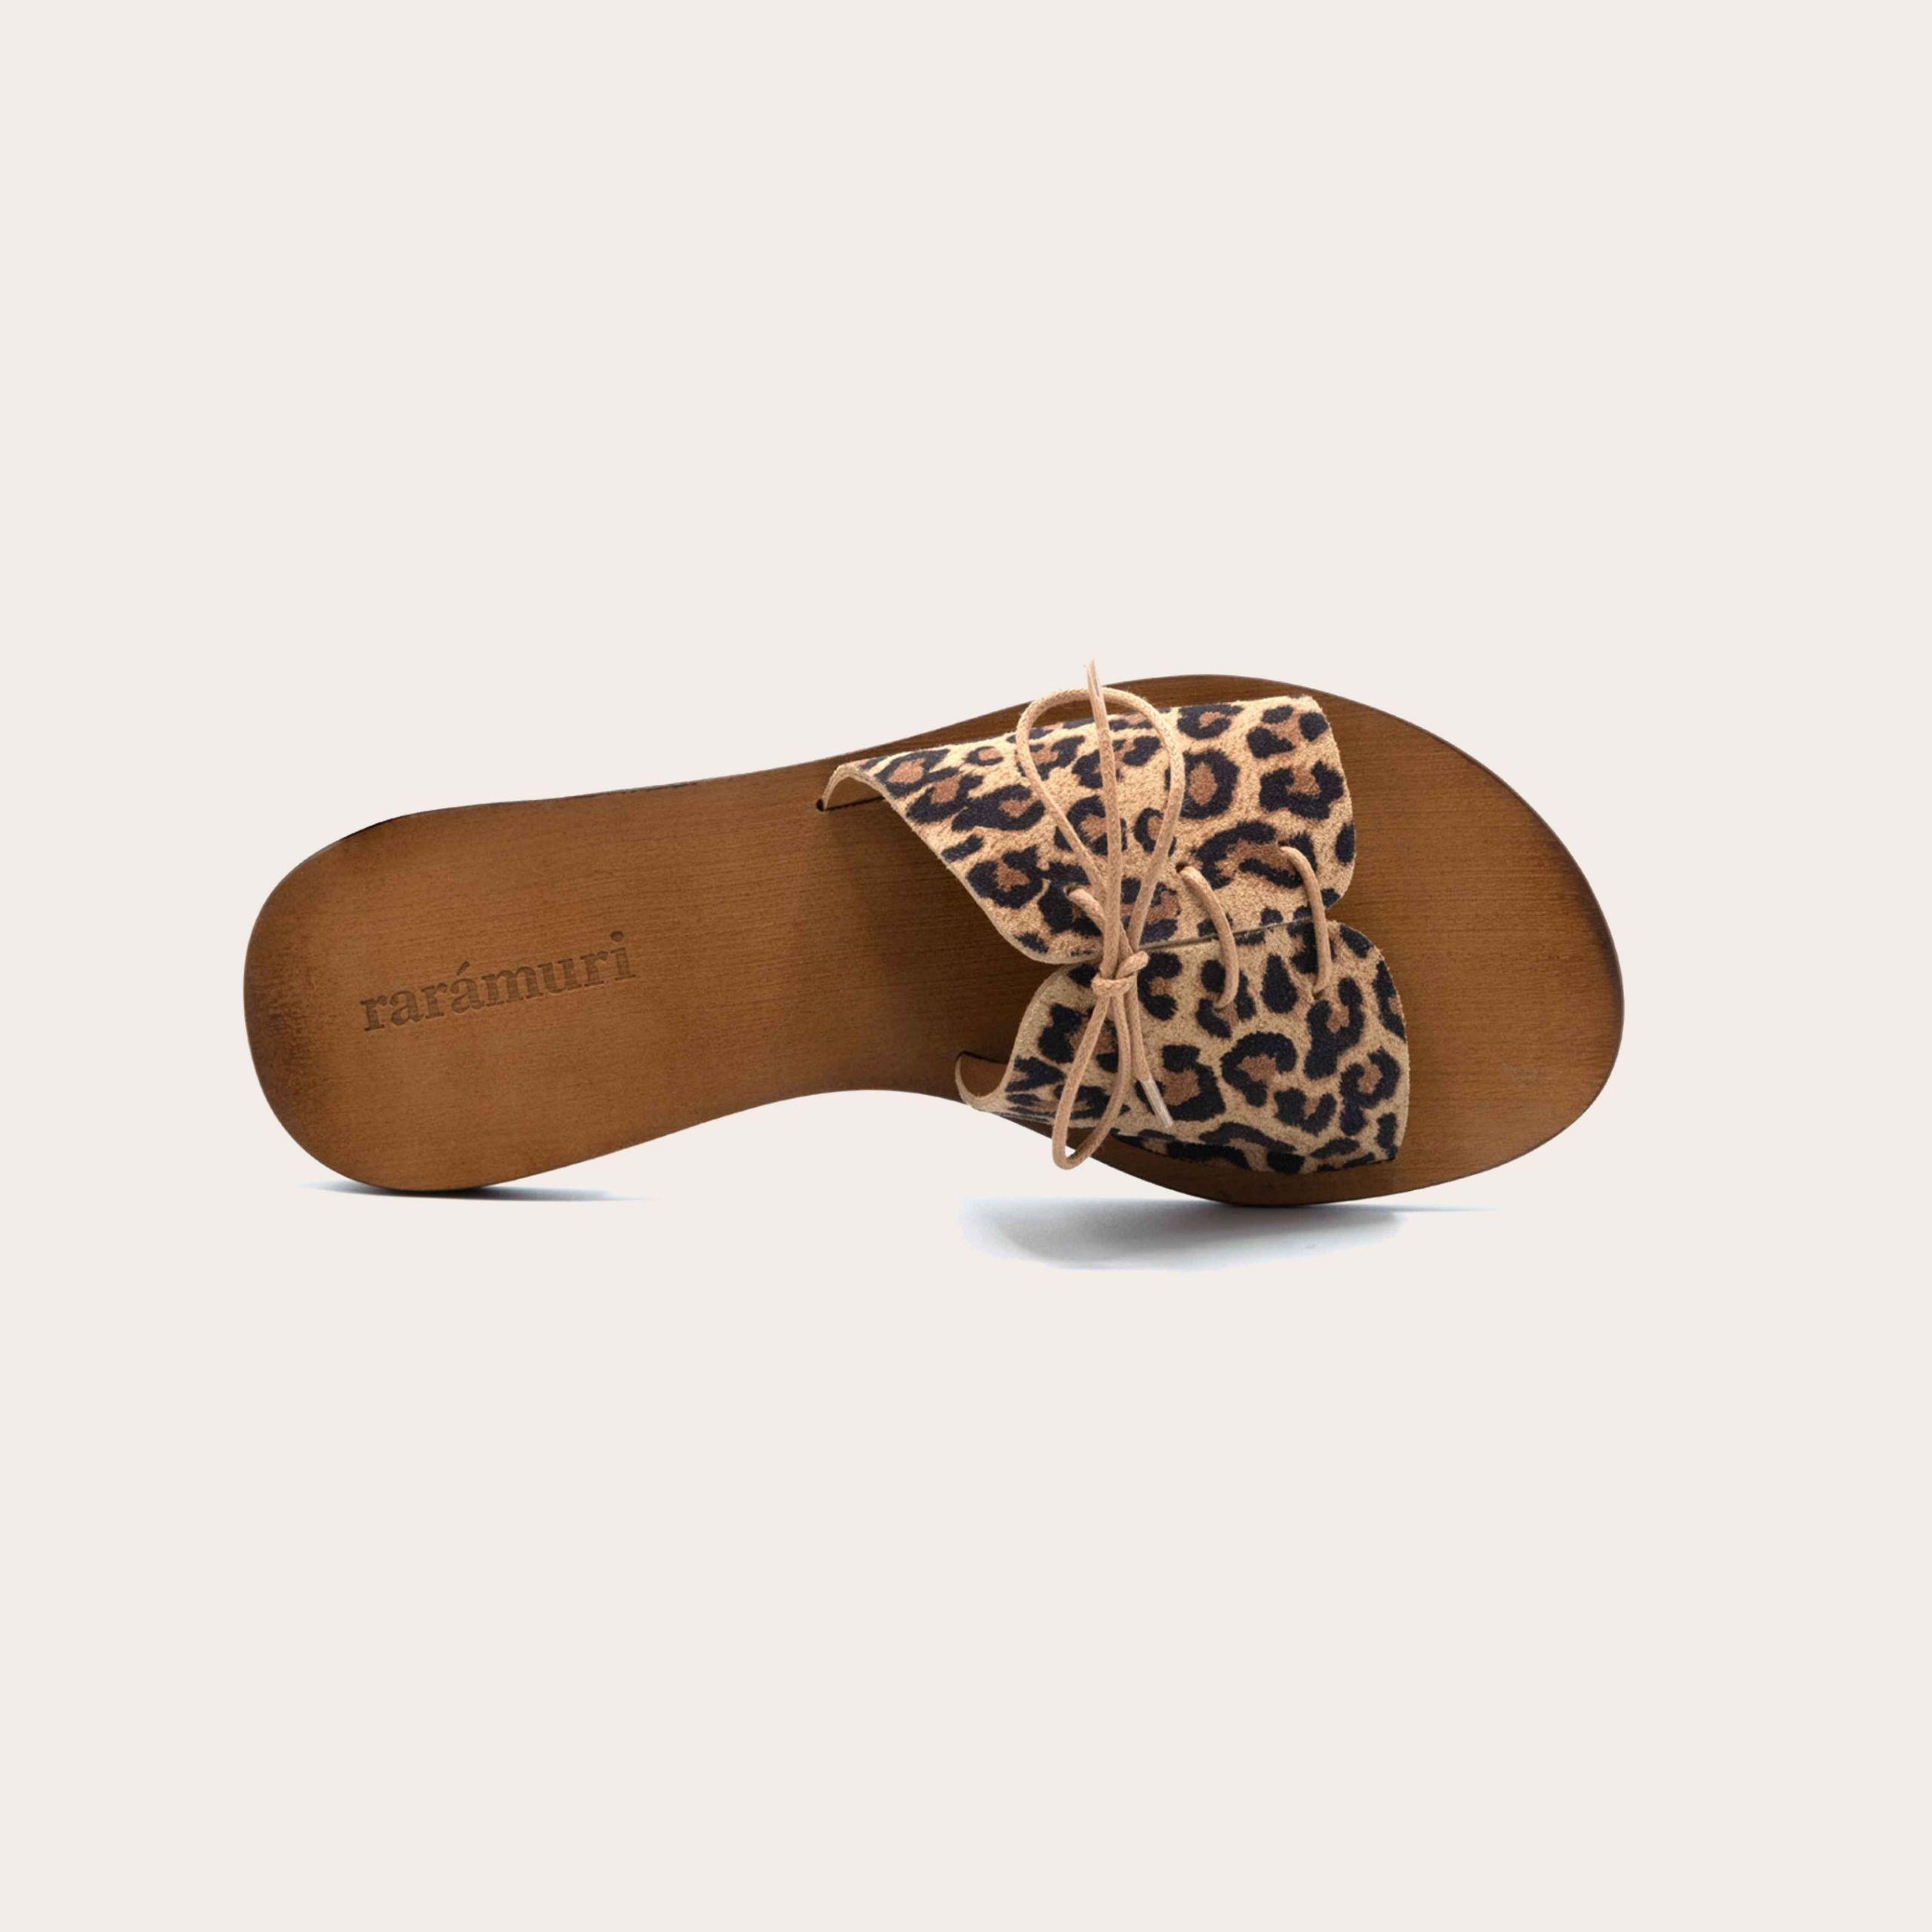 cali-leopard_2_lintsandalen sandals travelsandals vegan sustainable sandals wikkelsandalen